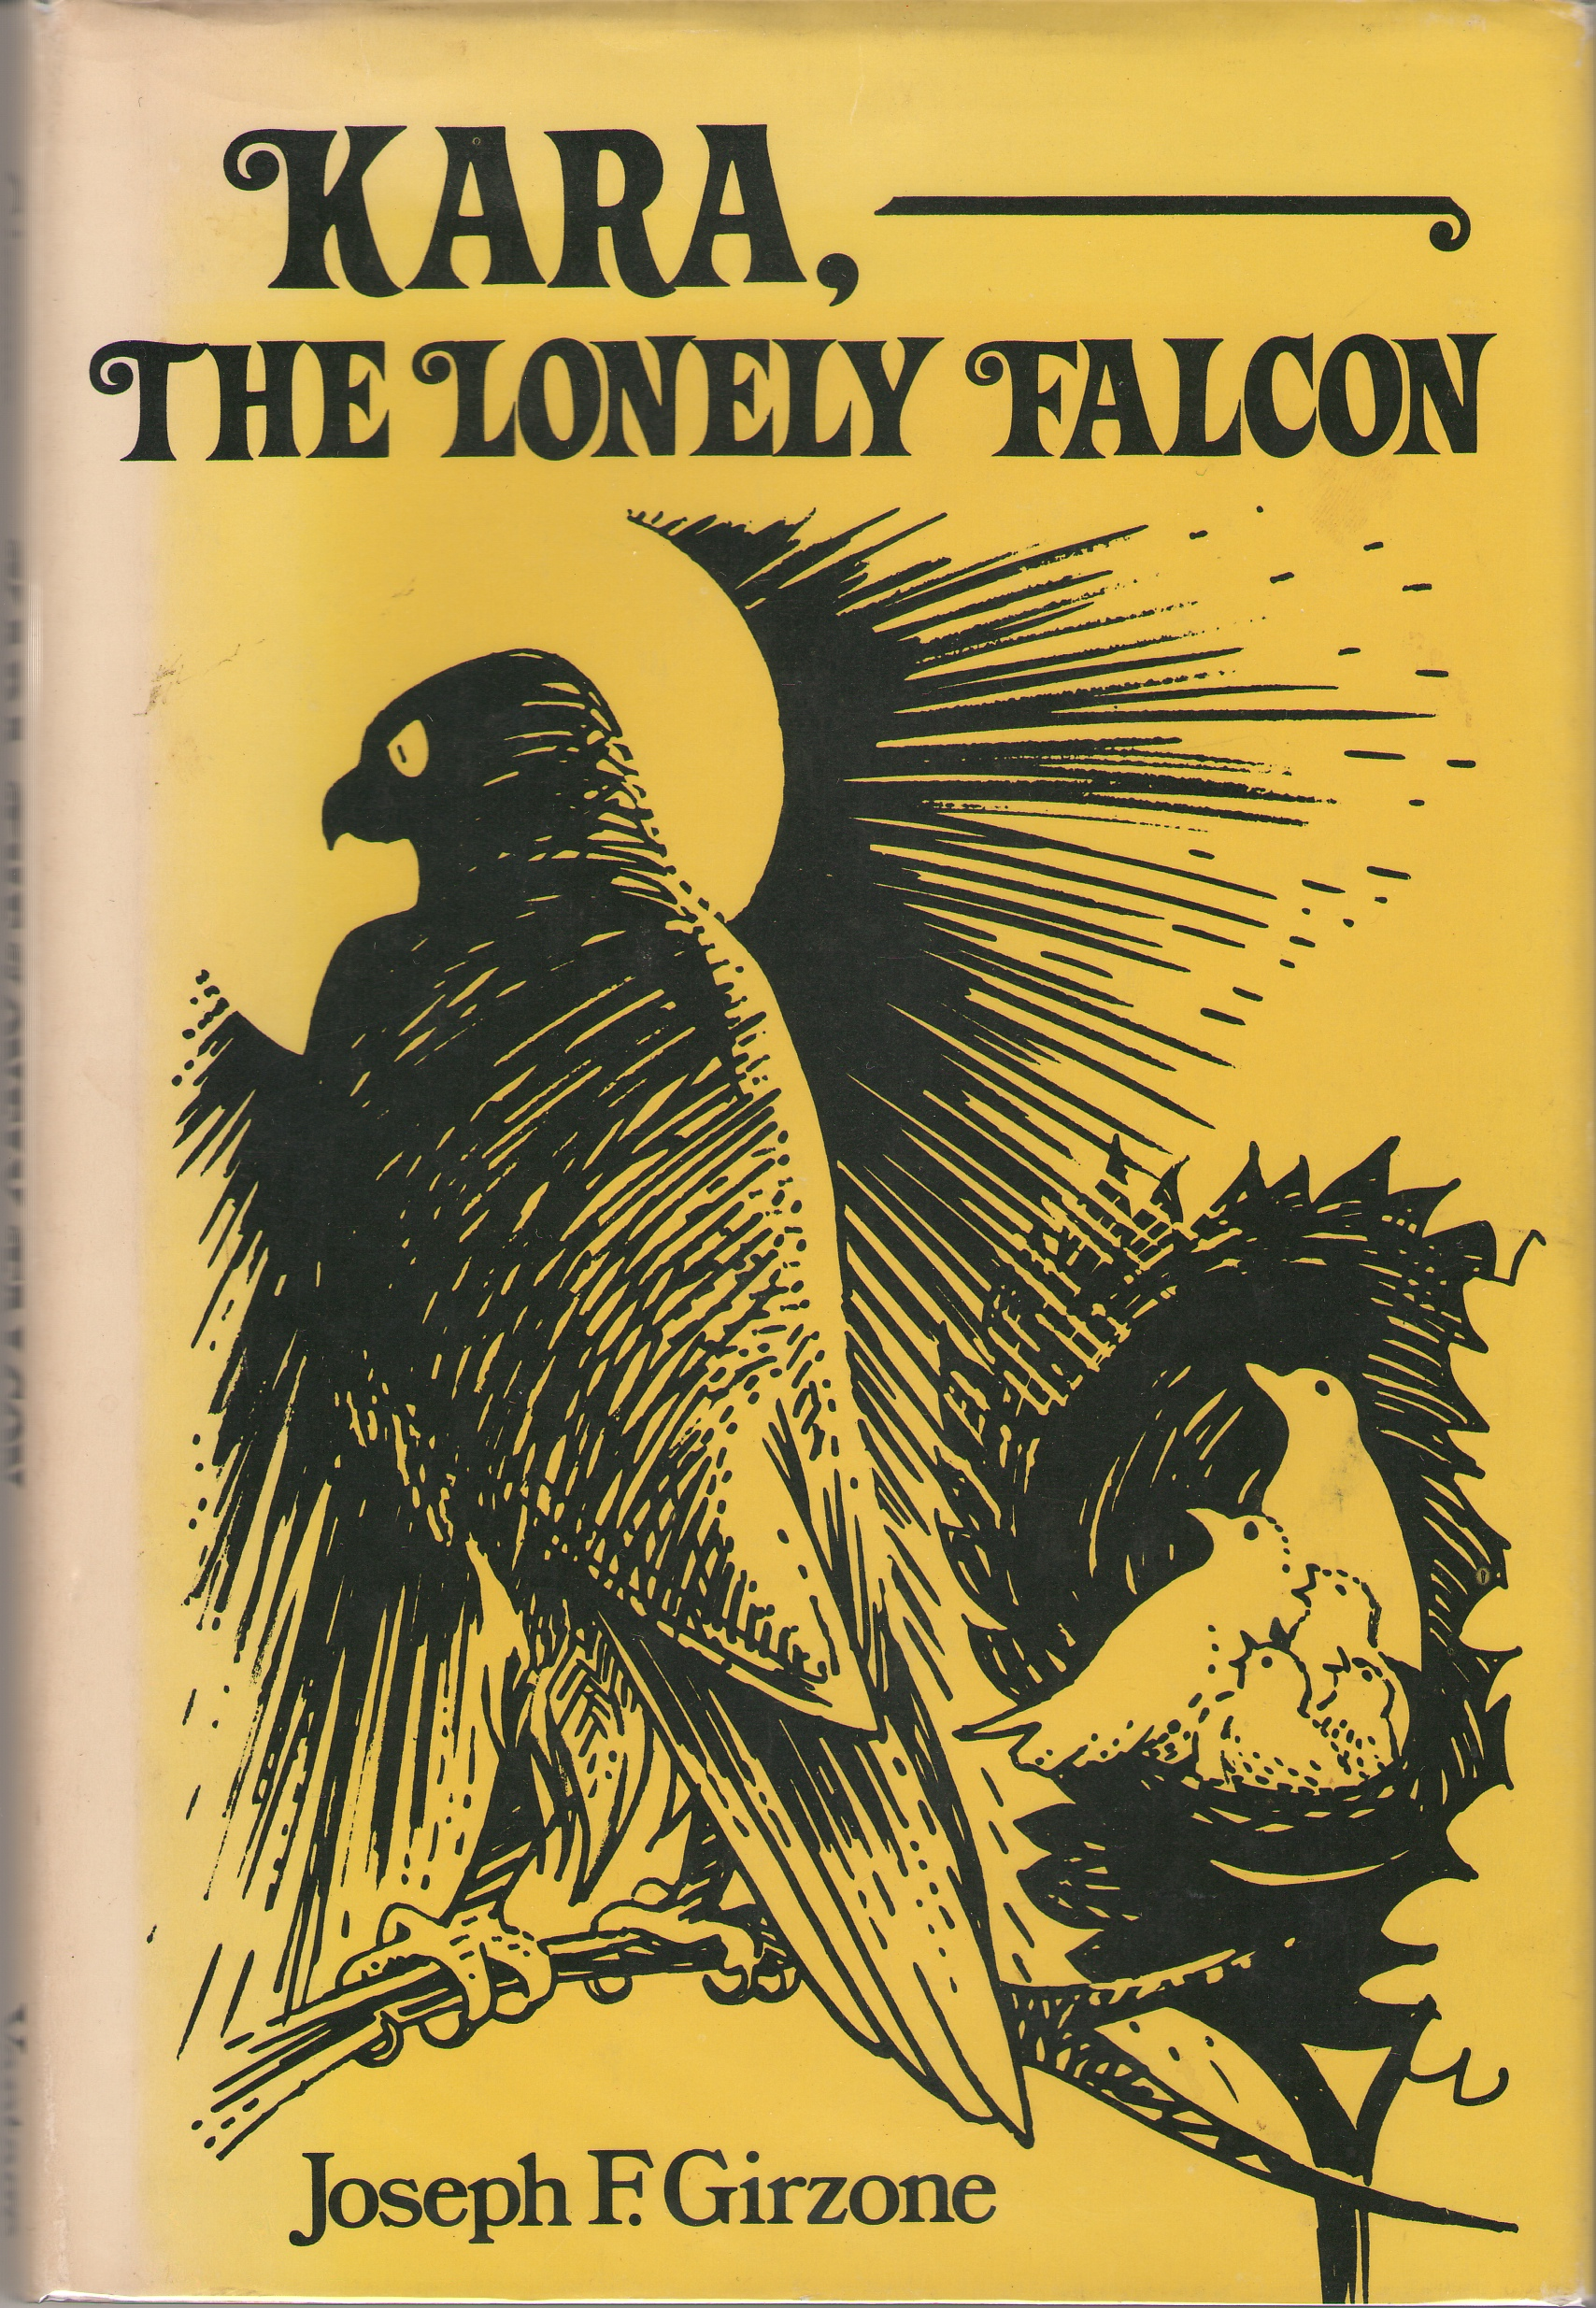 Kara, The Lonely Falcon, Girzone, Joseph F.